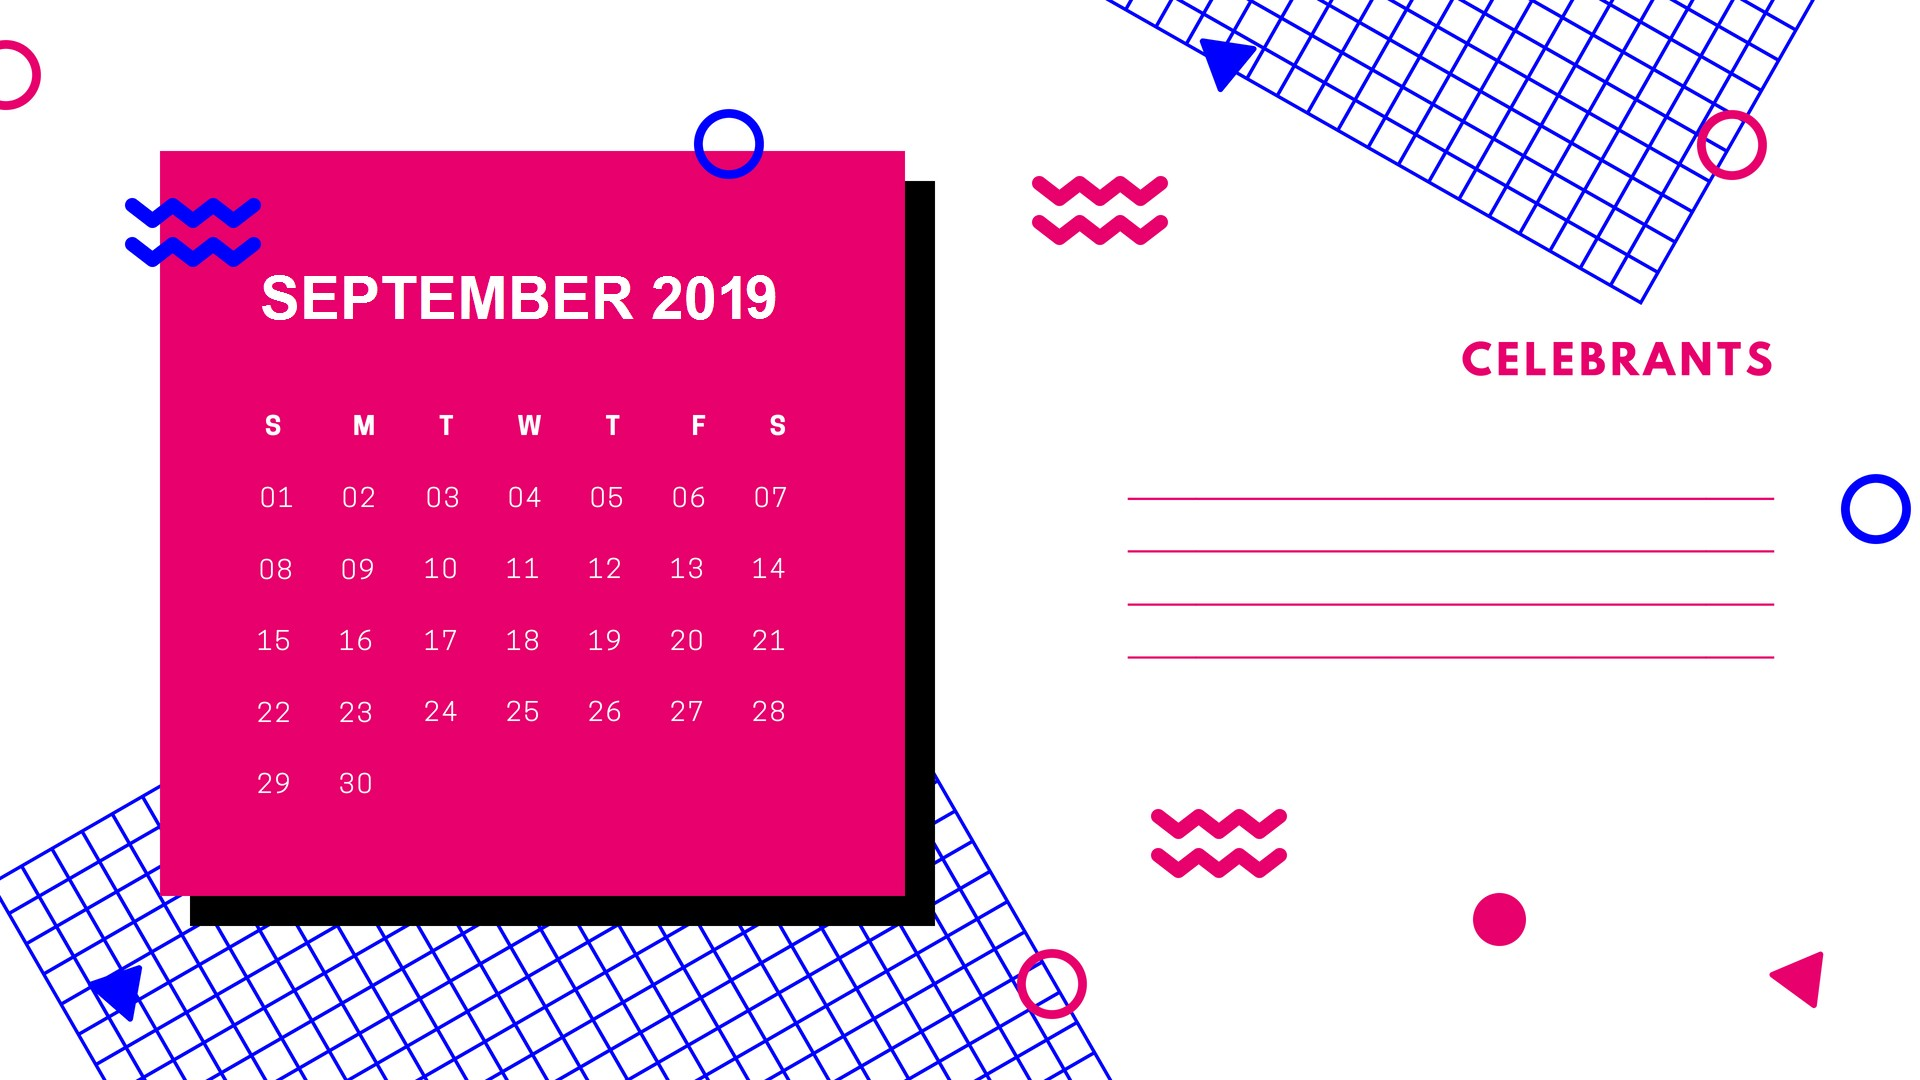 Stylish 2019 September Calendar 2019calendar PrintableCalendar calendar2019 calendar CalendarTemplate calendardesign